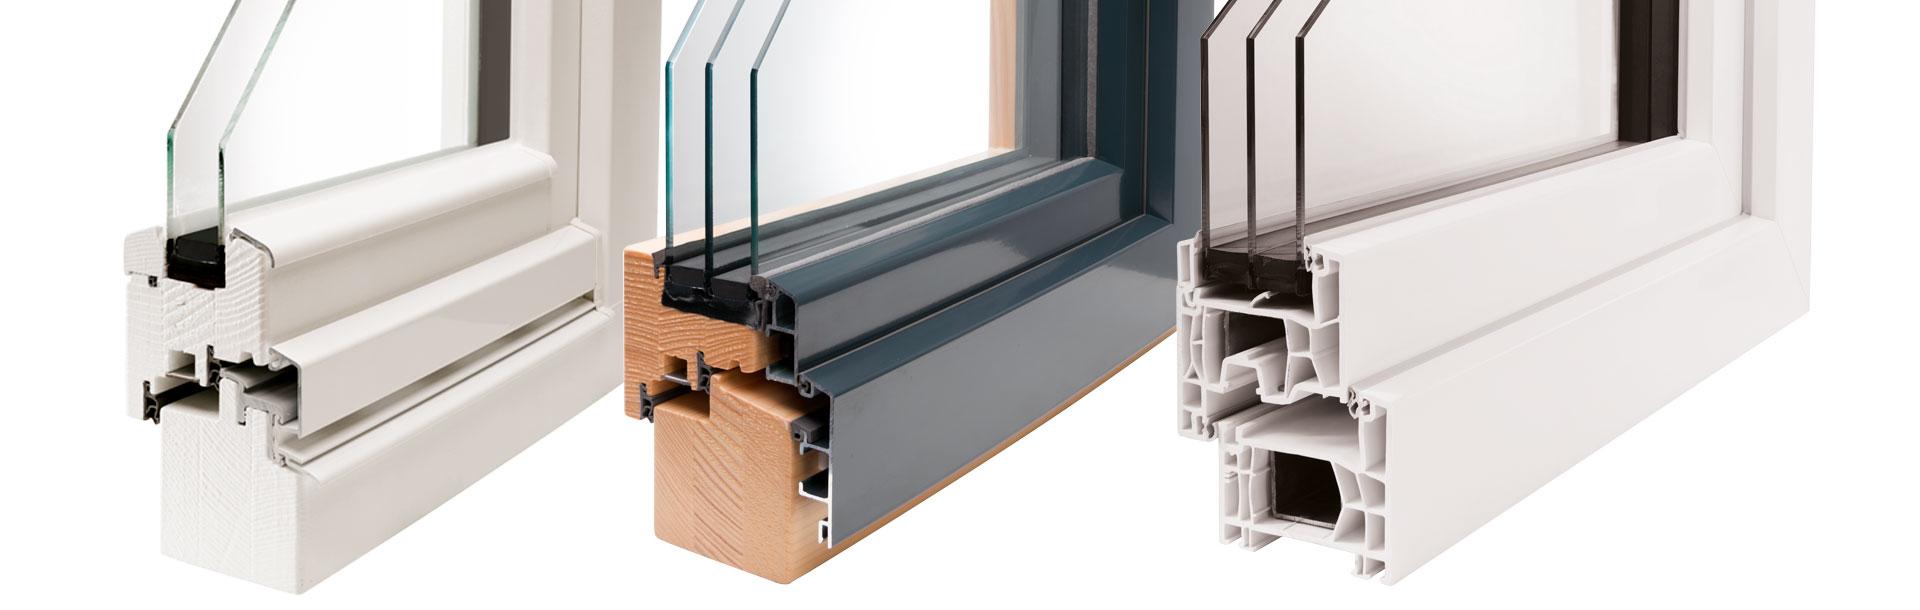 energiekosten rechner lauber fensterbau. Black Bedroom Furniture Sets. Home Design Ideas